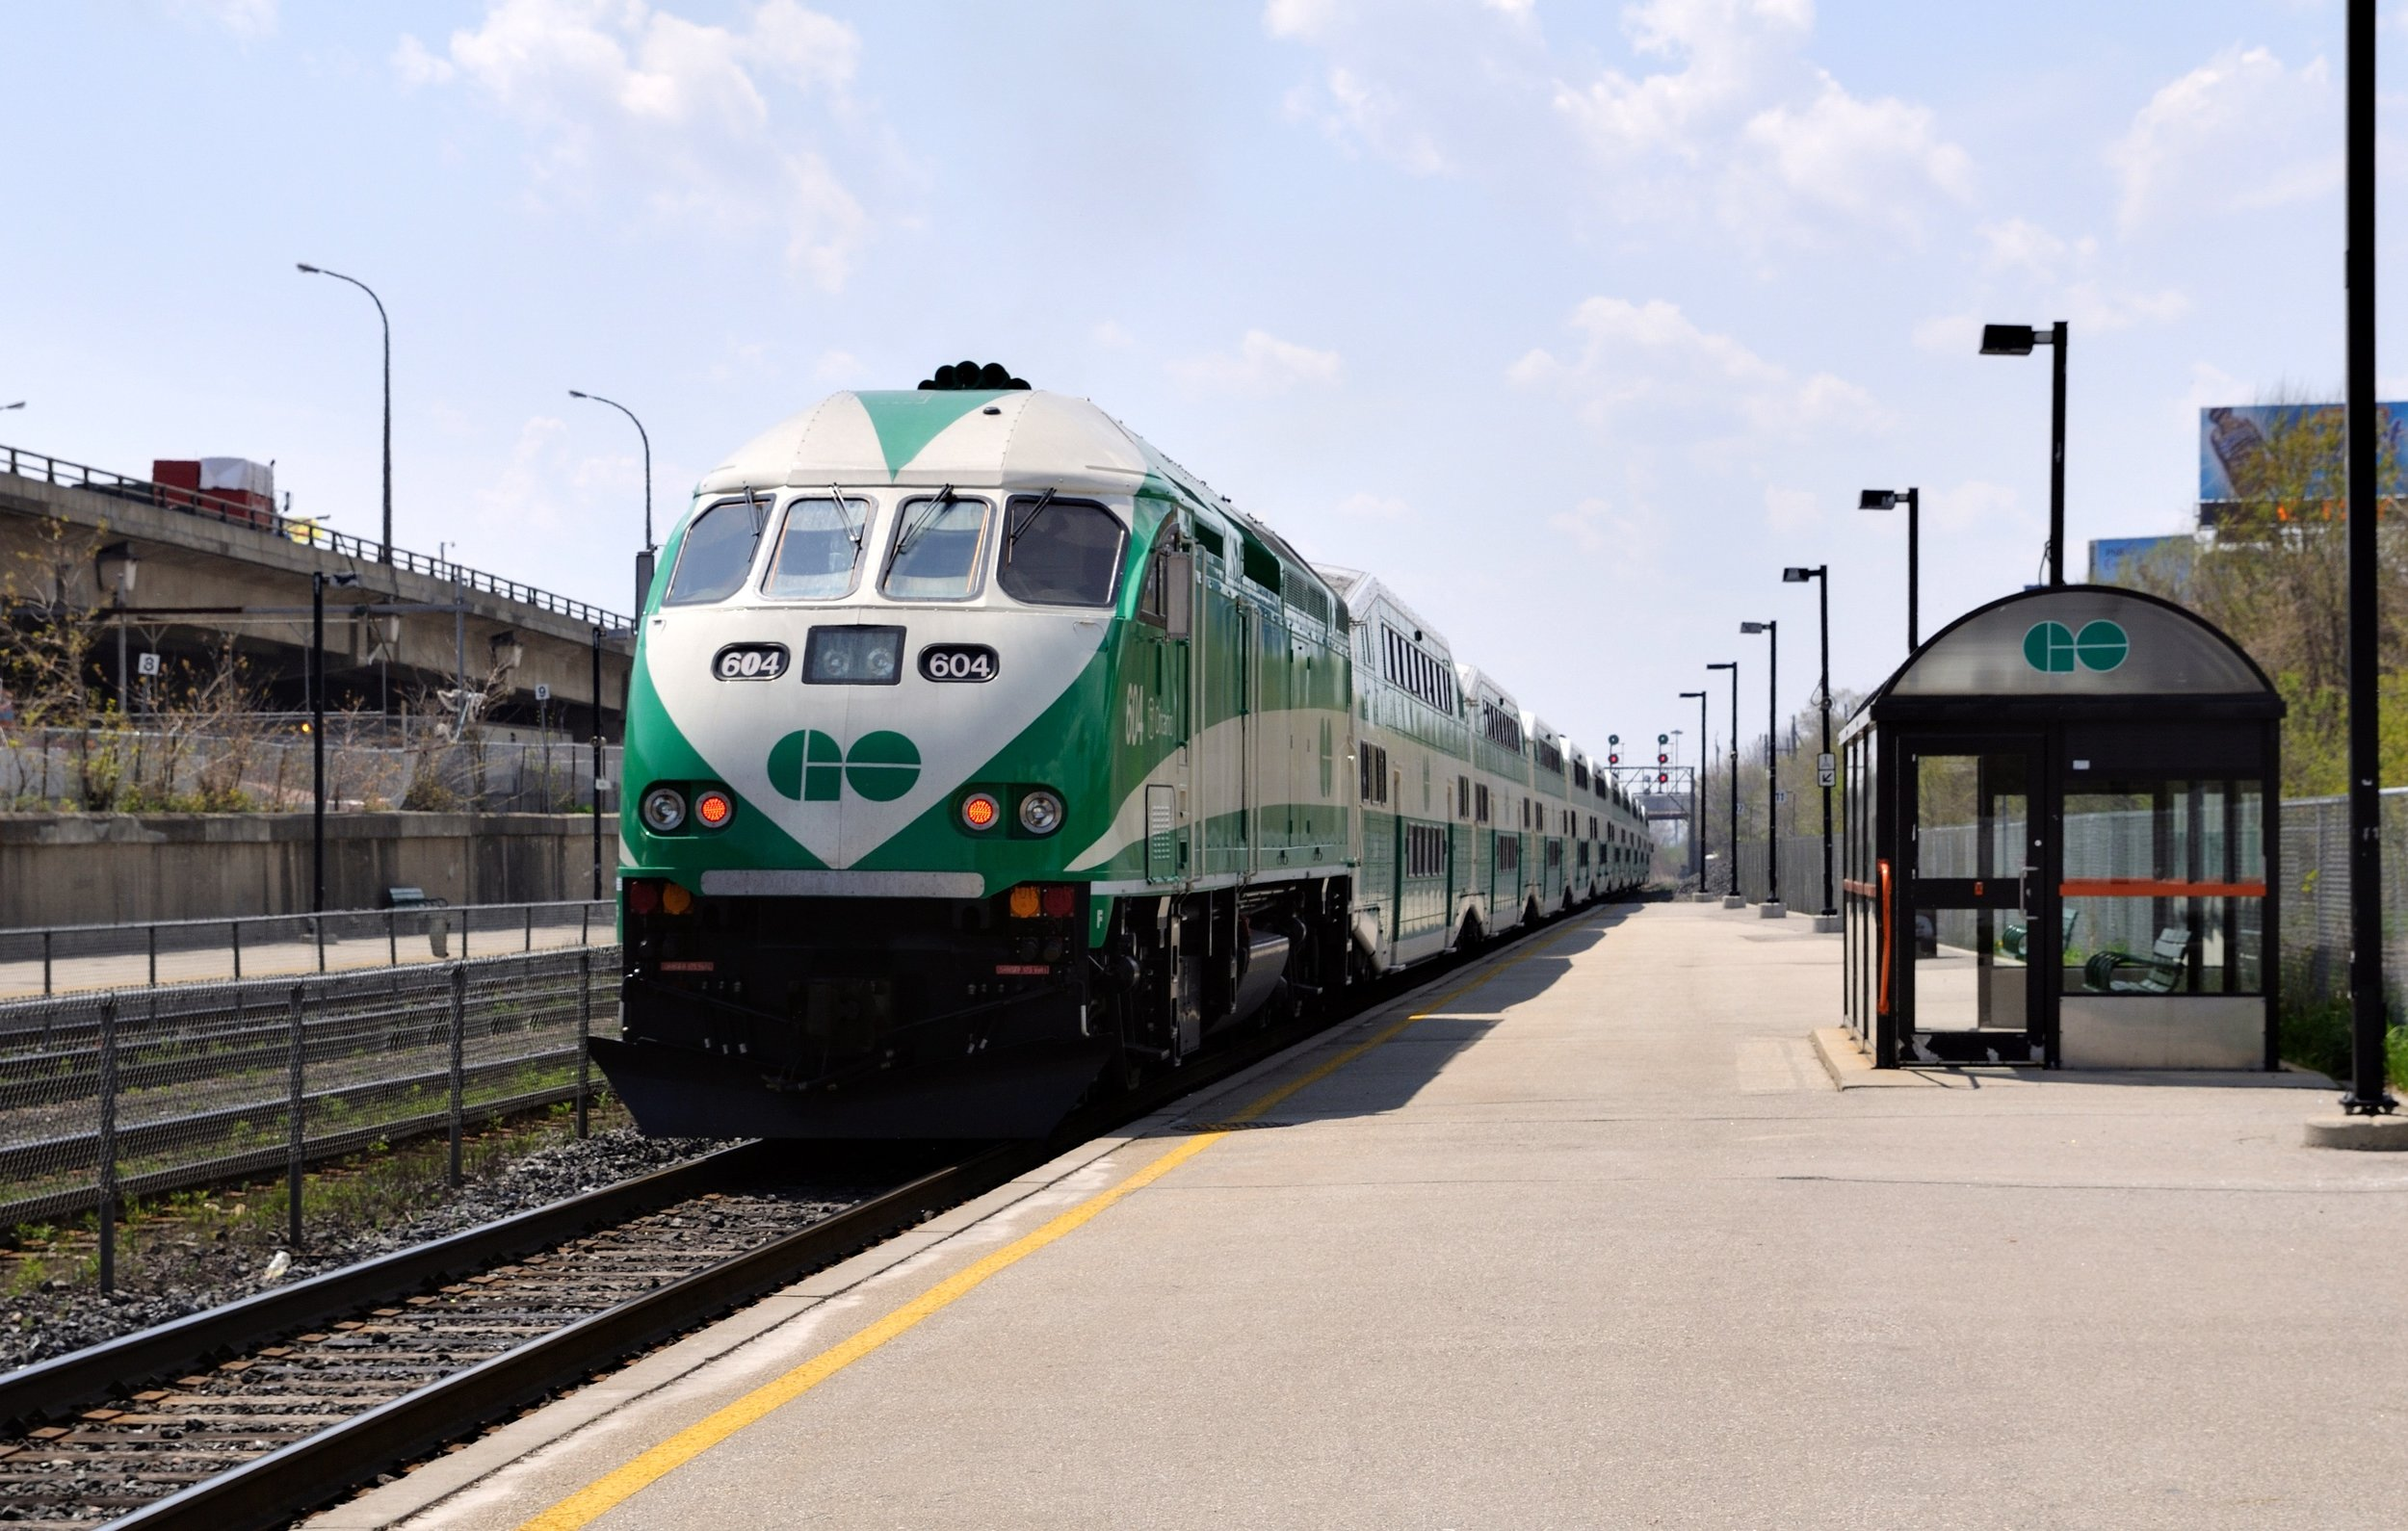 Toronto_-_ON_-_Ontario_-_GO_Transit_diesel_locomotive.jpg